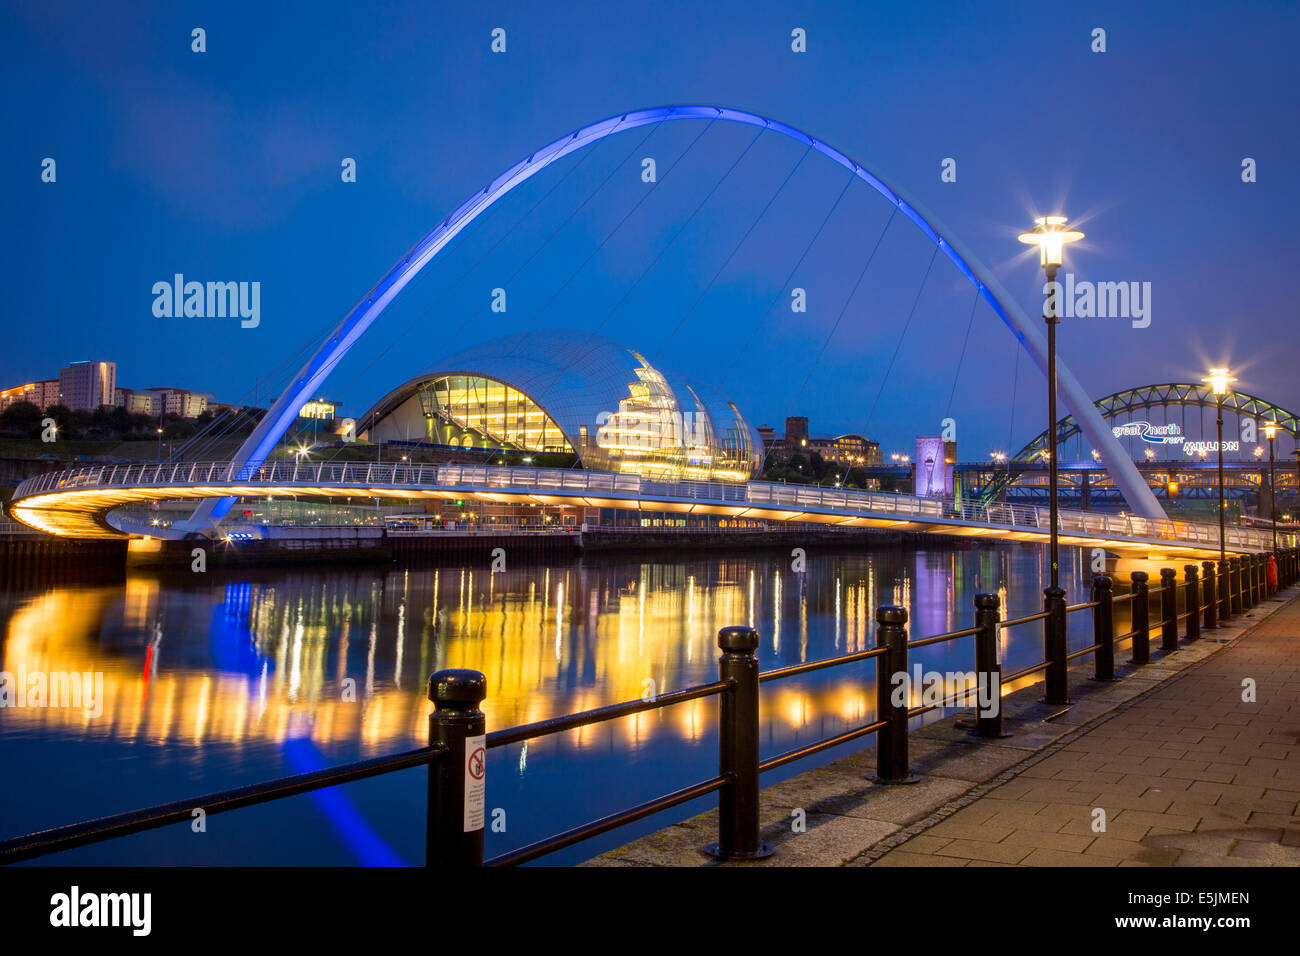 Il Gateshead Millennium Bridge e la Salvia riflessa nel fiume Tyne, Newcastle-Upon-Tyne, Tyne and Wear, Inghilterra Foto Stock